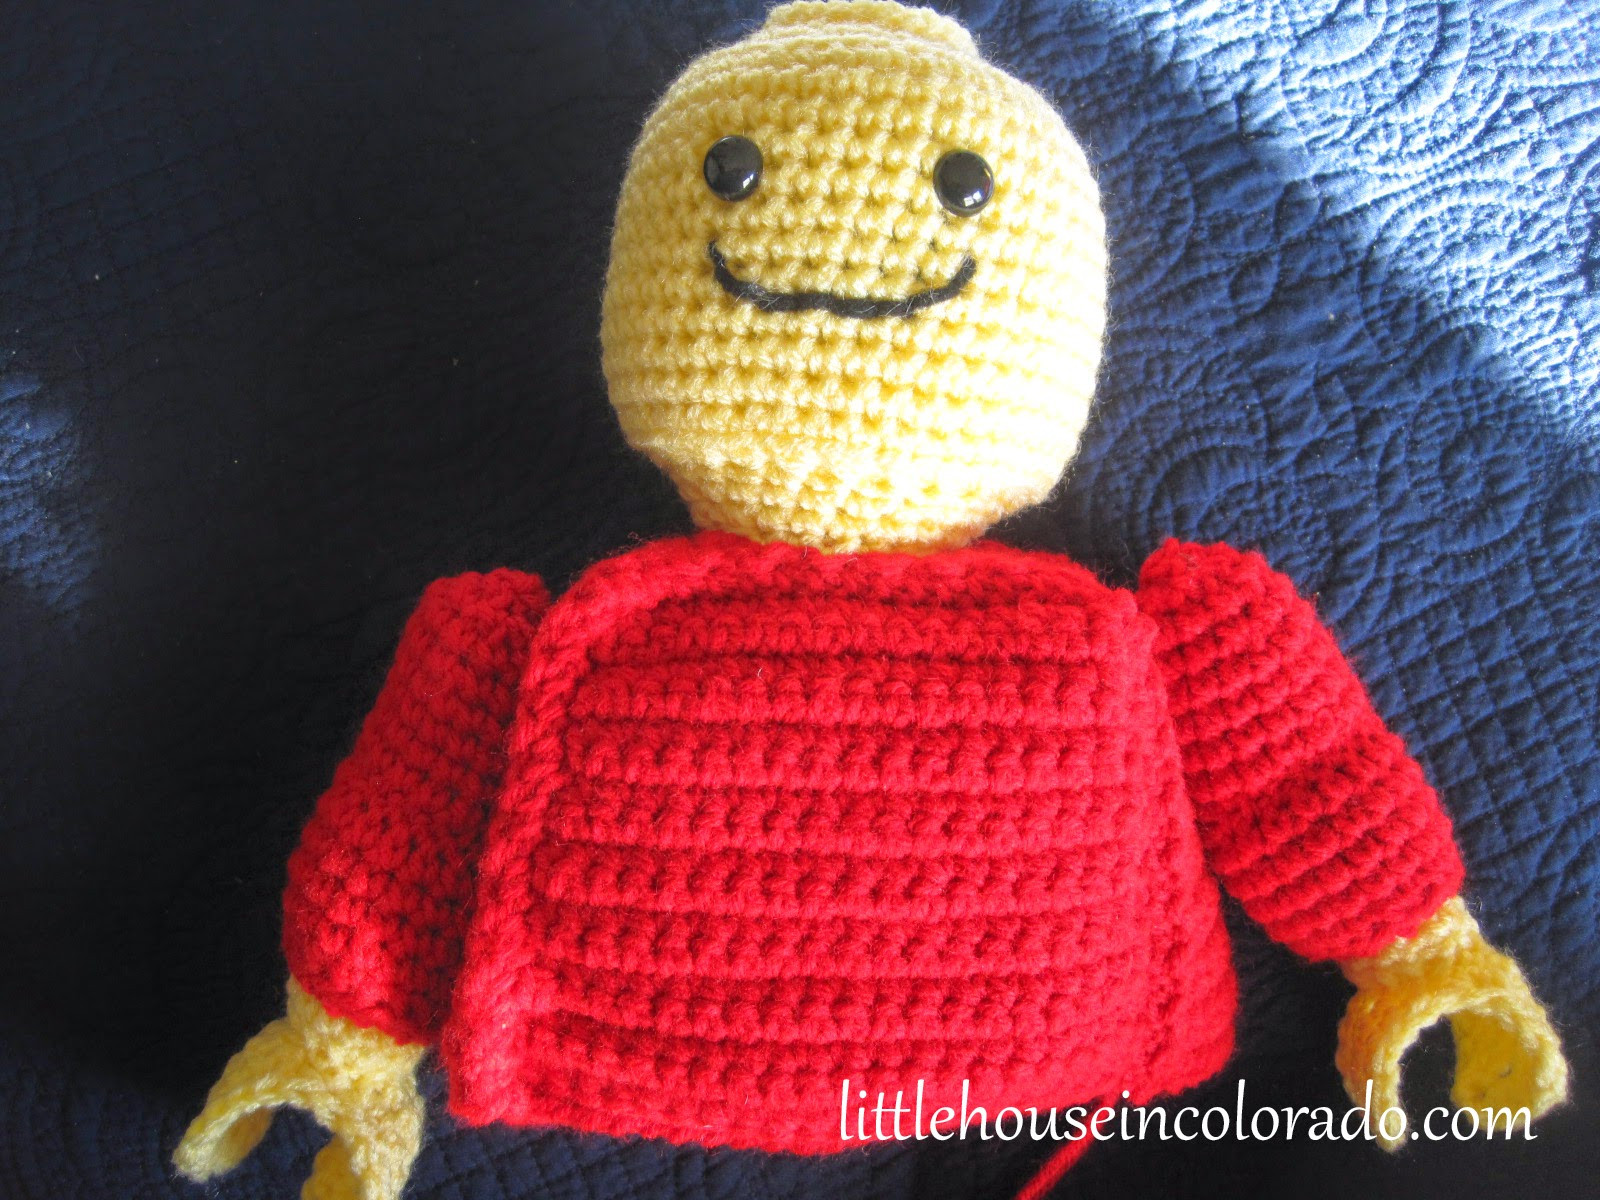 Amigurumi Attaching Arms : Little House In Colorado: Pattern For Amigurumi Crochet ...